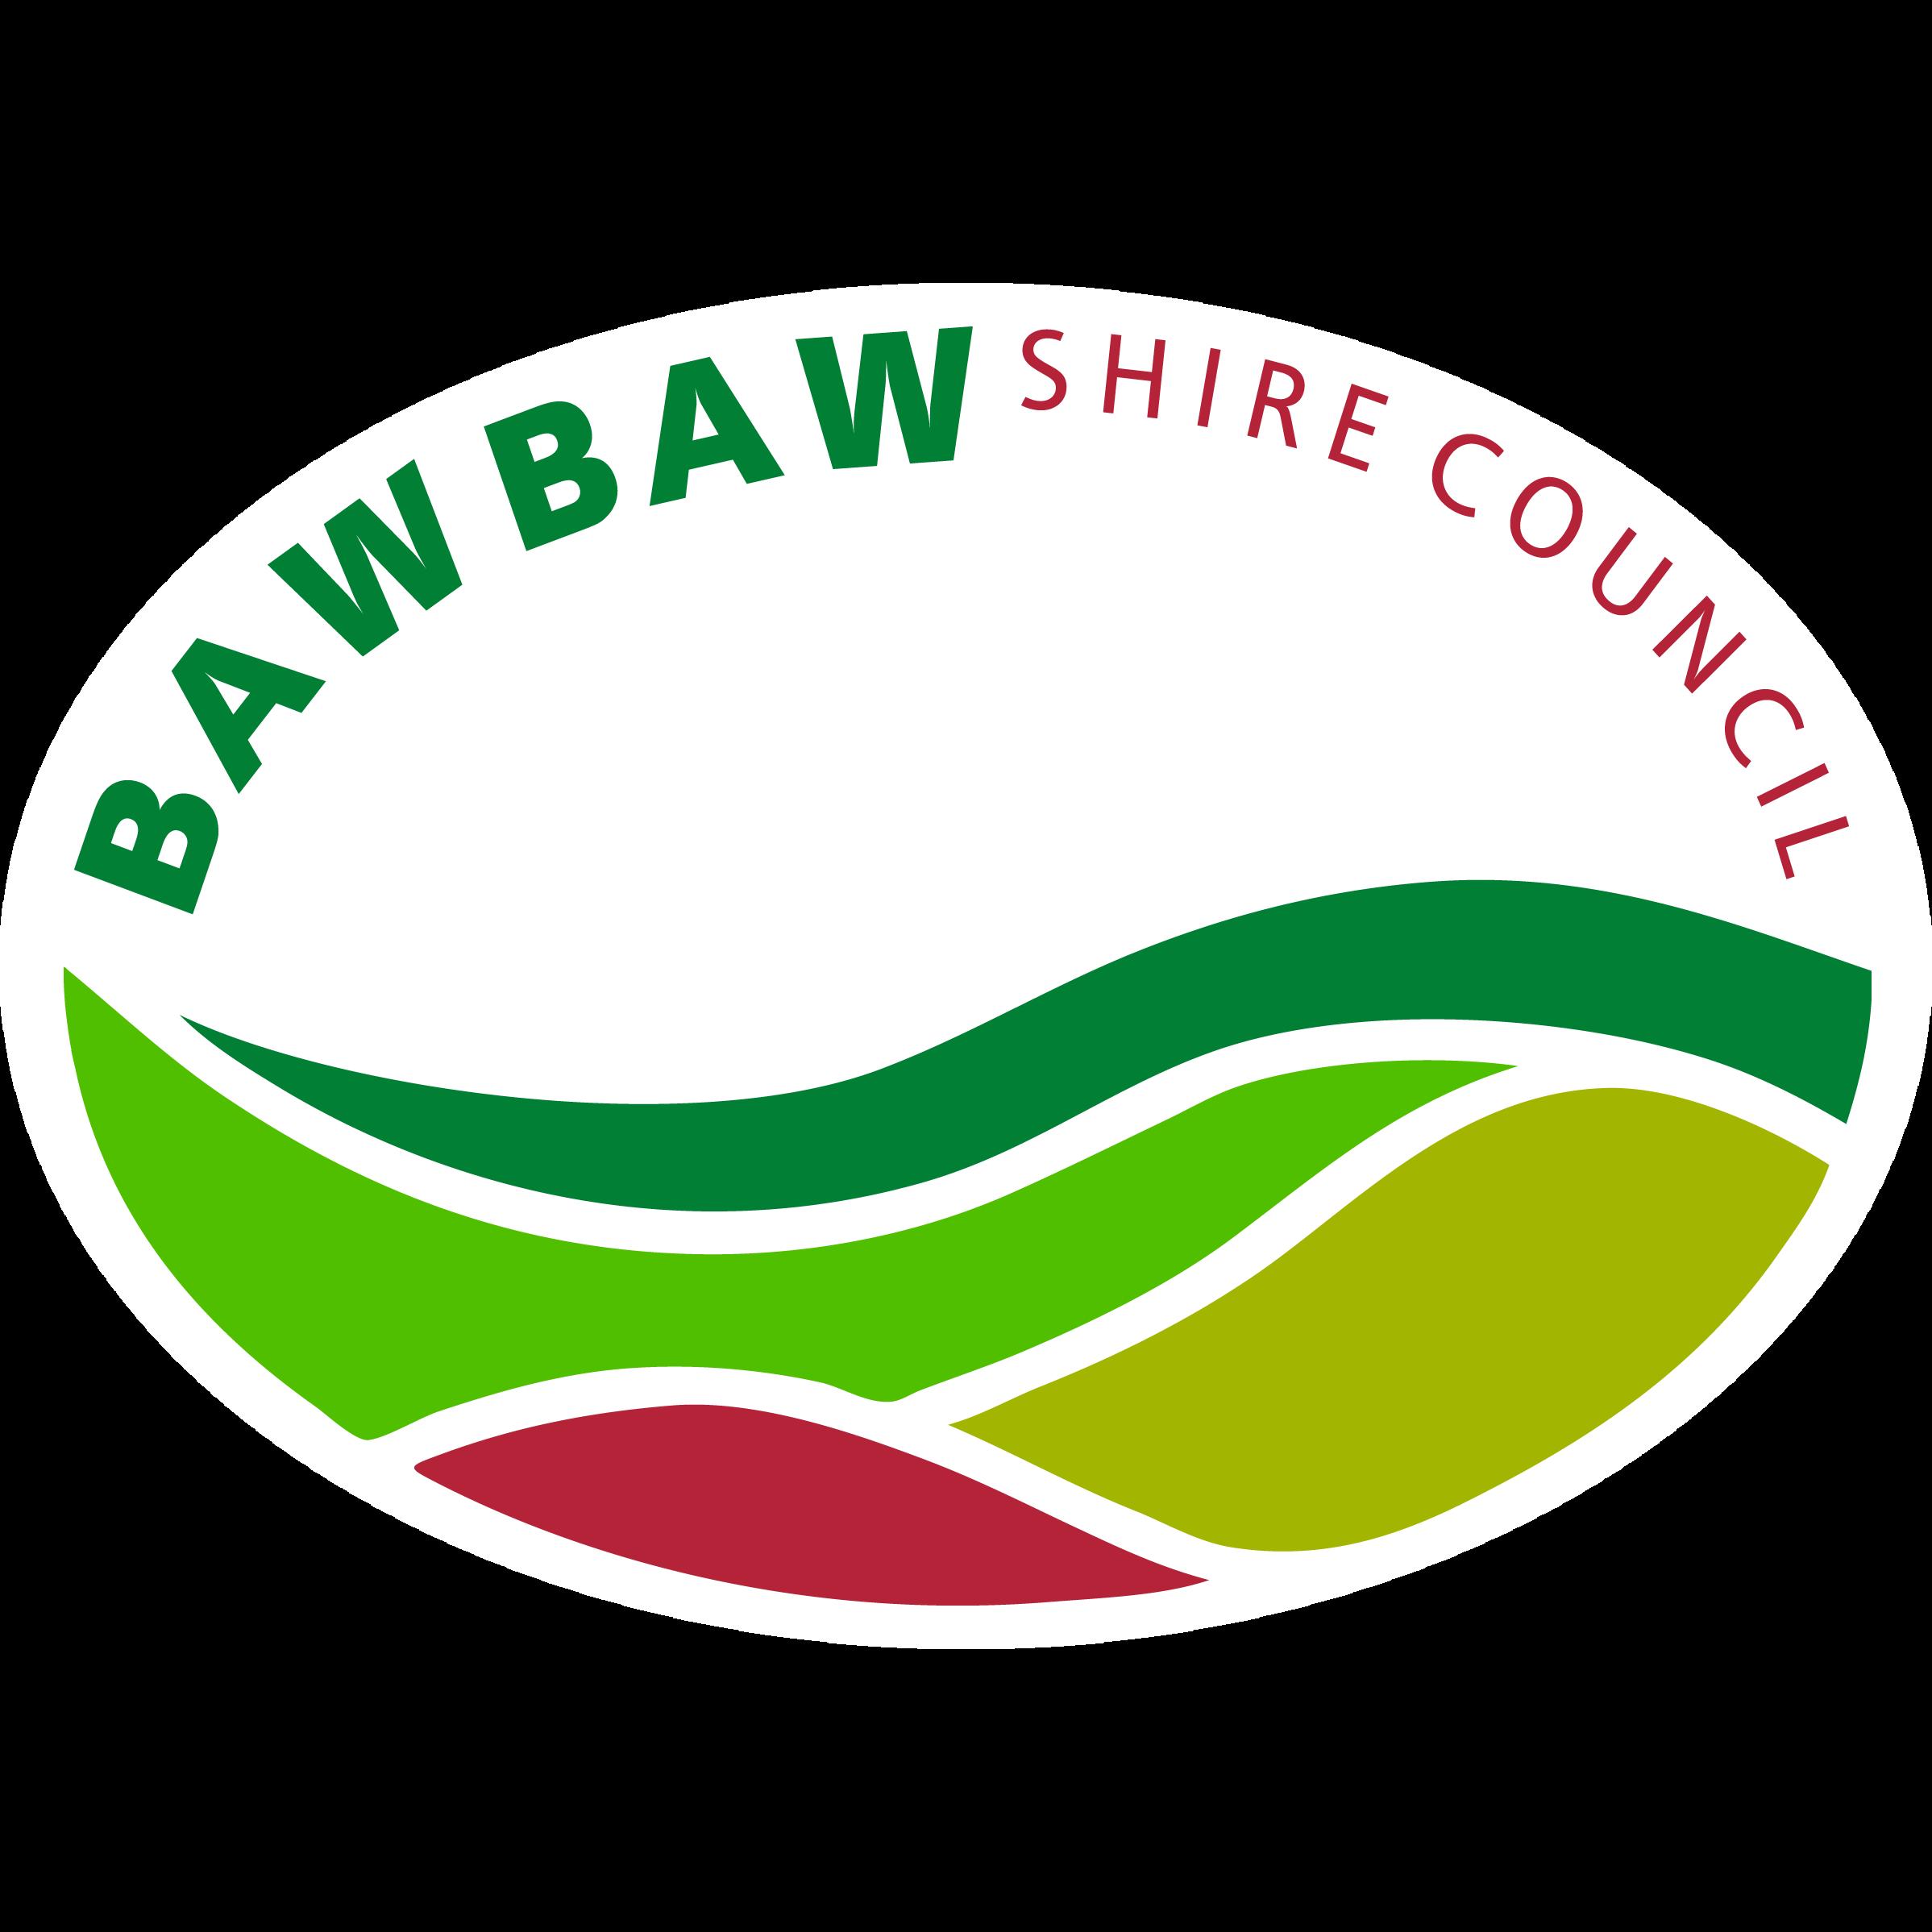 Baw Baw Shire Council   90 Smith Street, Warragul, Victoria 3820   +61 3 5624 2411